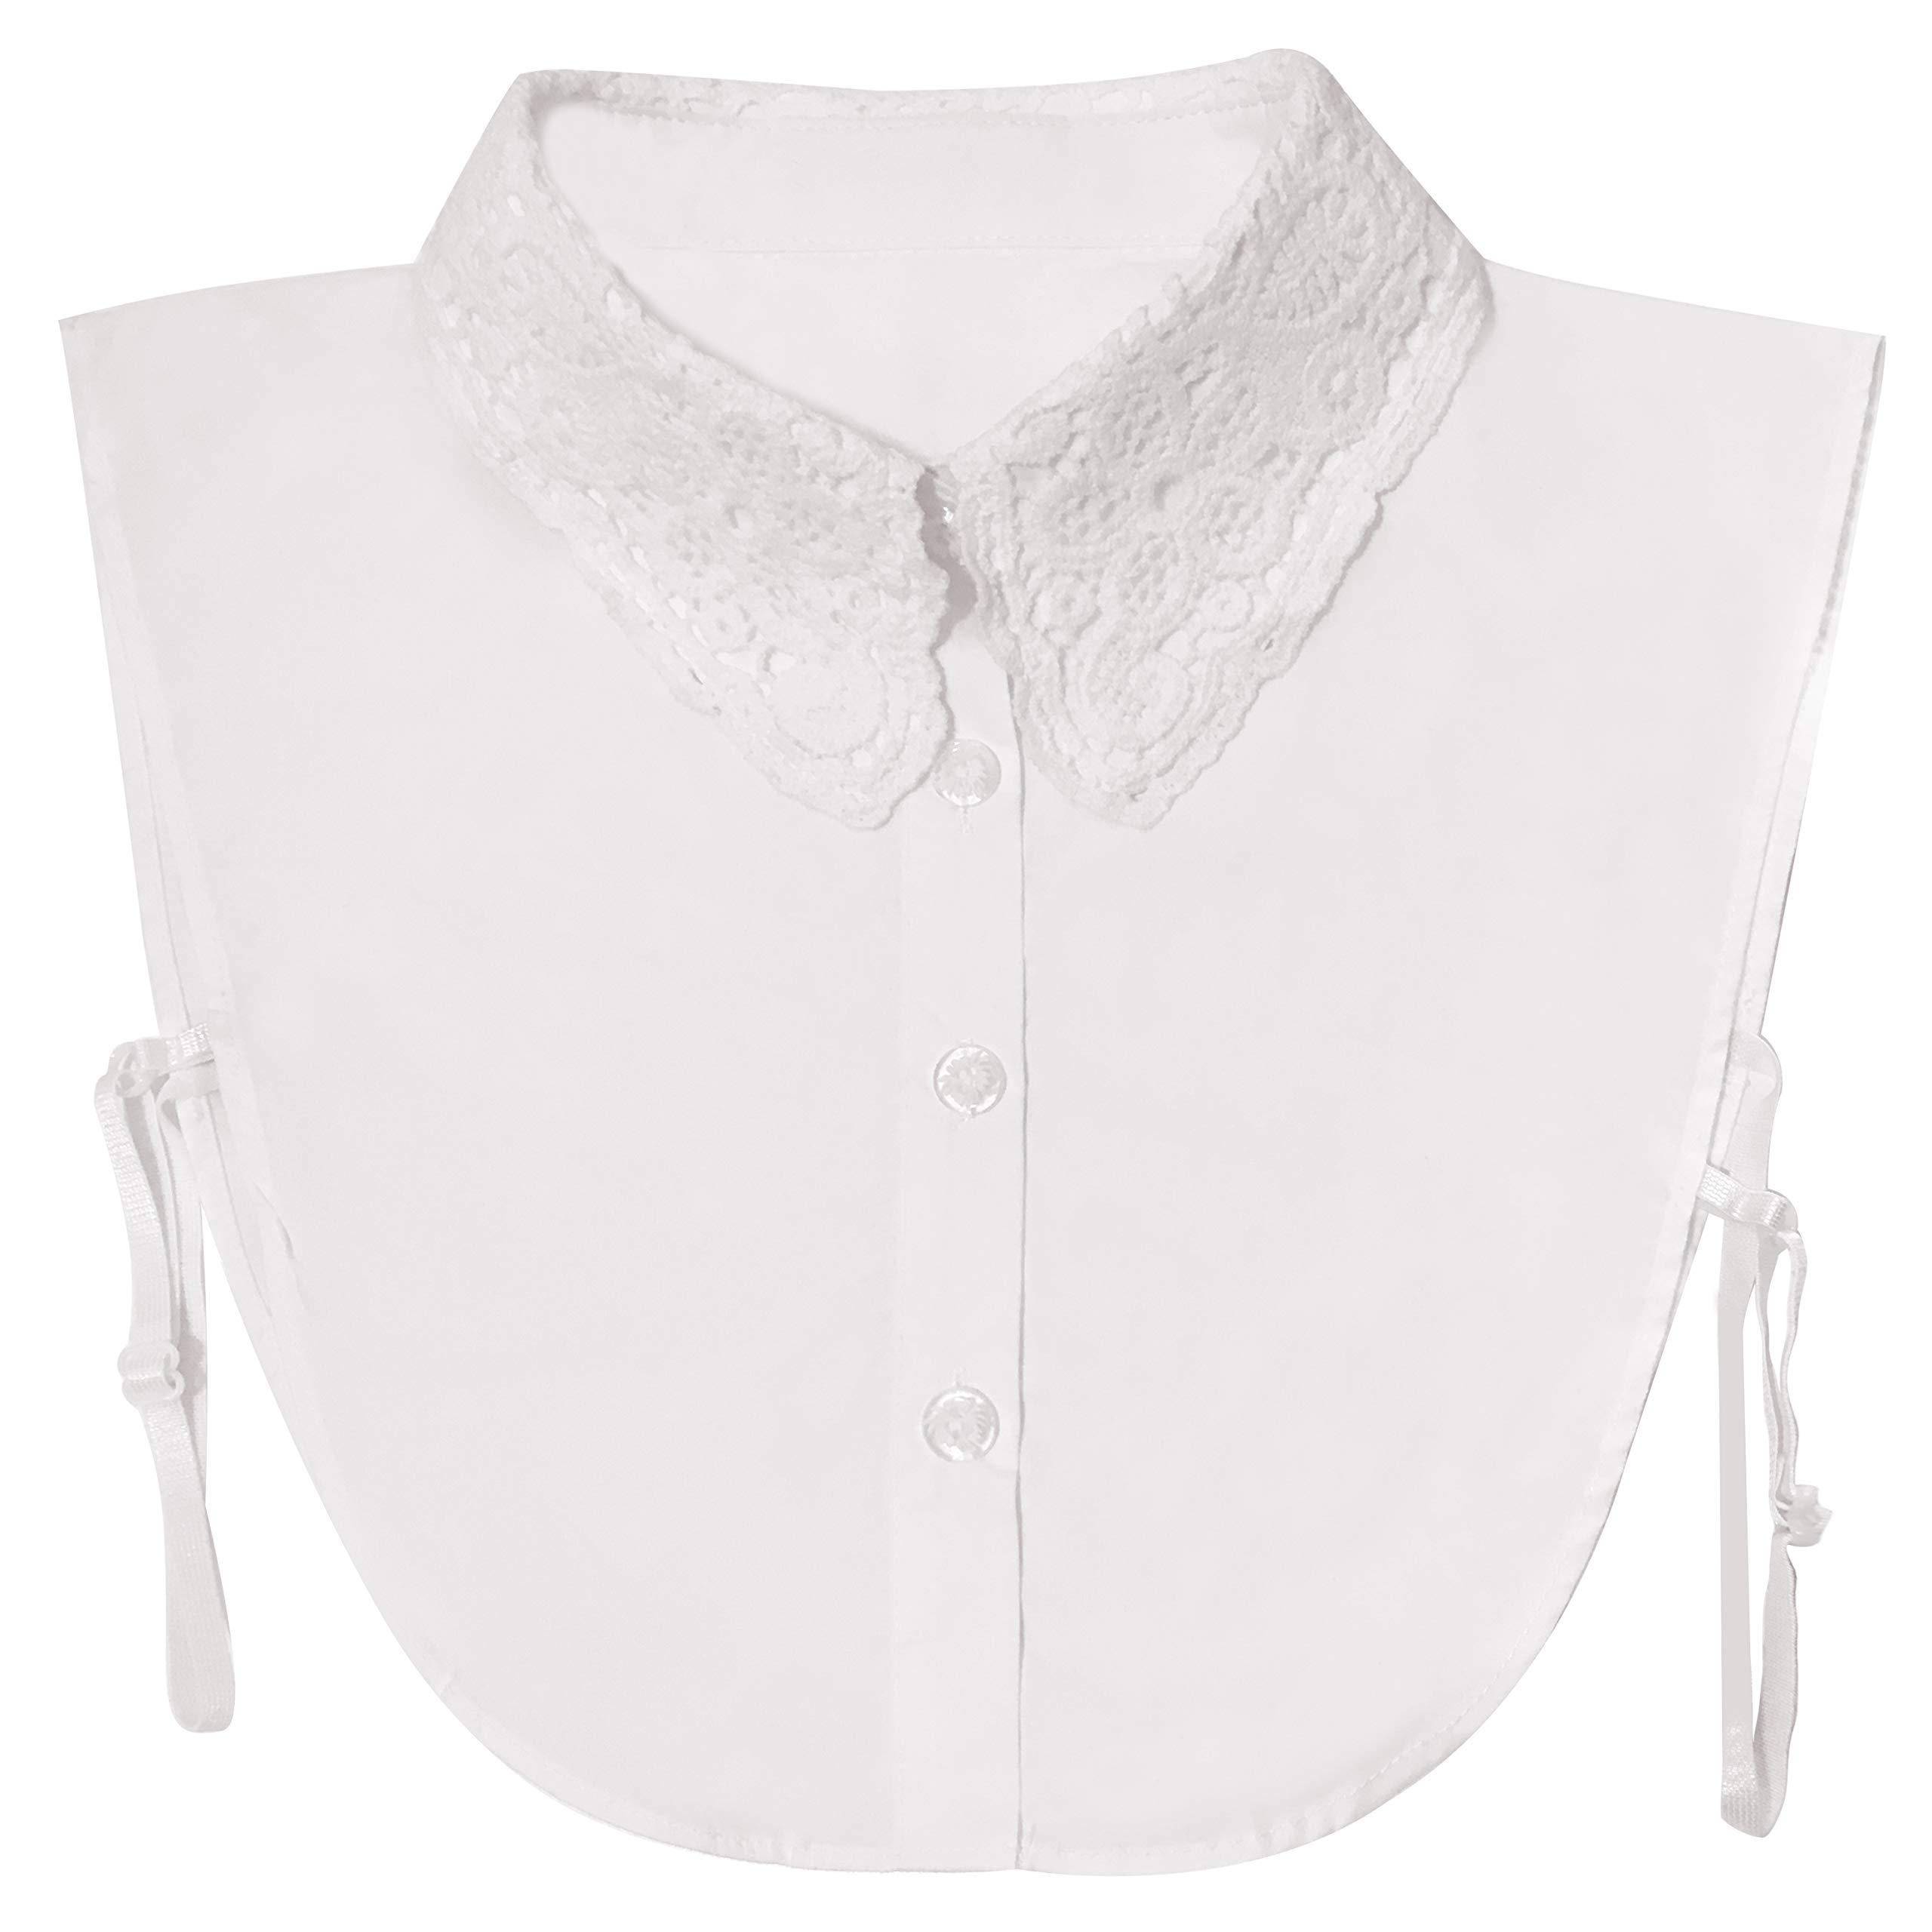 Ronessy Fake Collar for Women, Half Shirt Detachable Blouse Collar Tie (Style B)